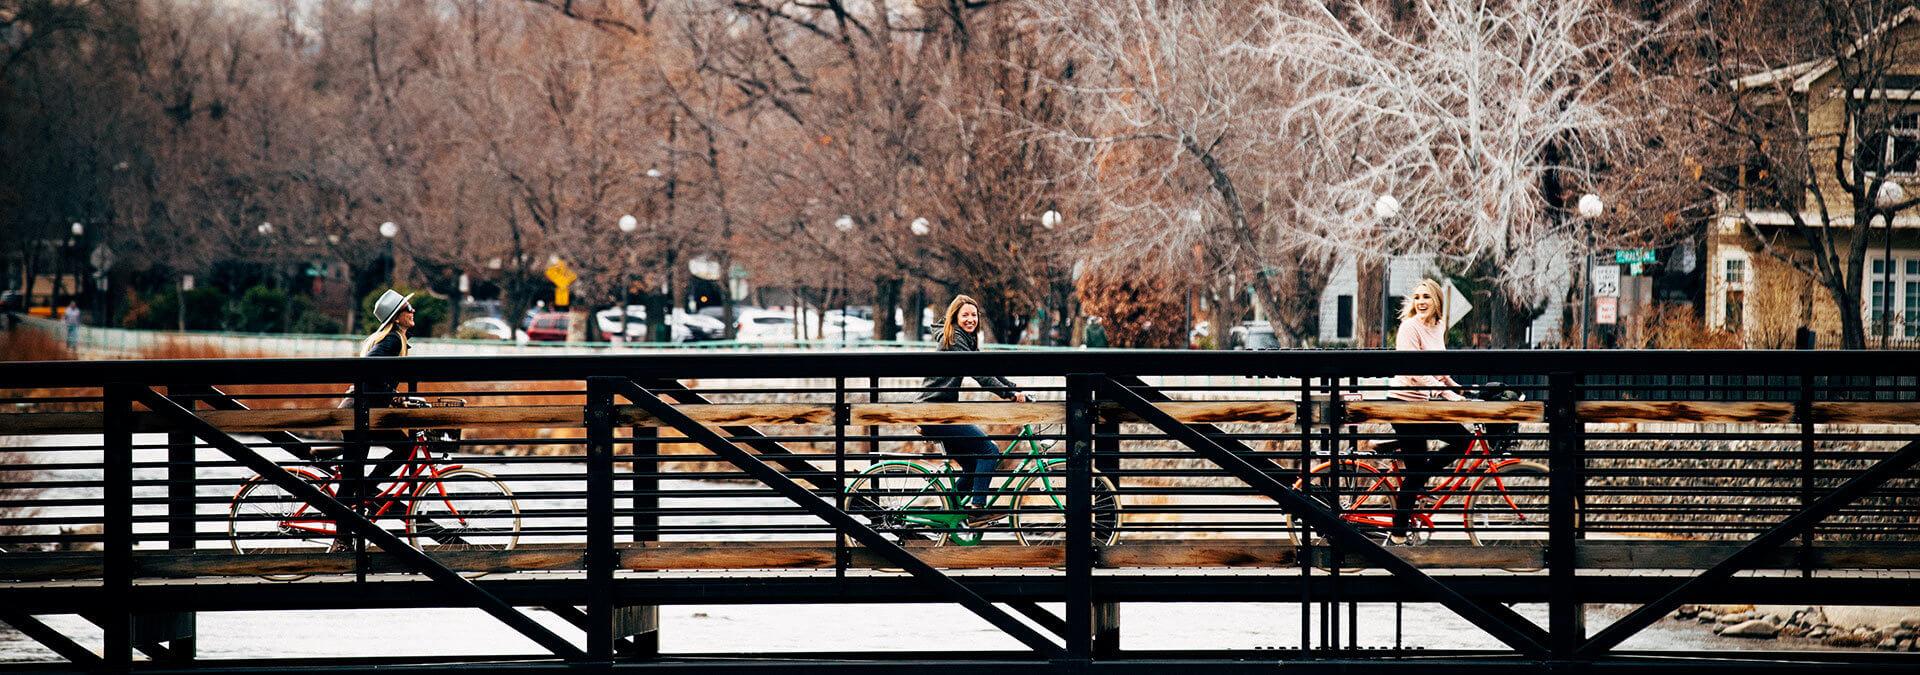 Alisa Geiser, Ali Nicklas,_ River Walk Biking